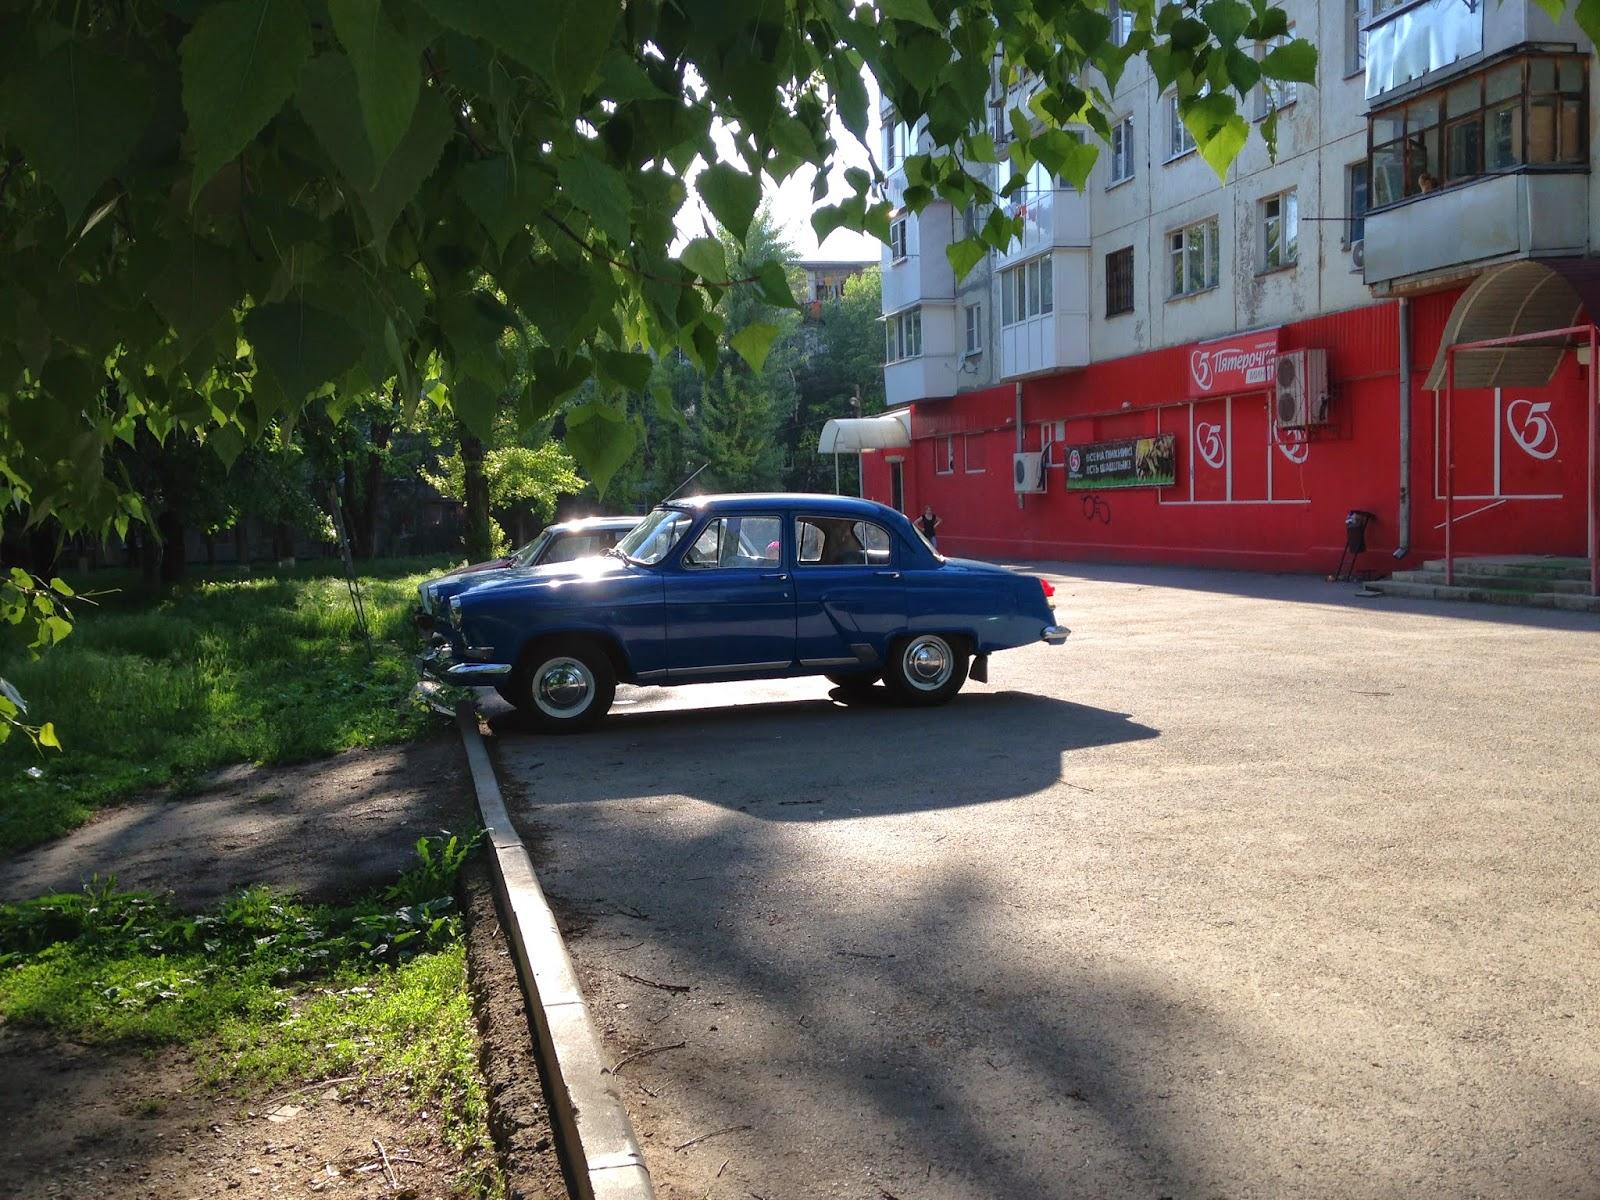 Волга-Старая